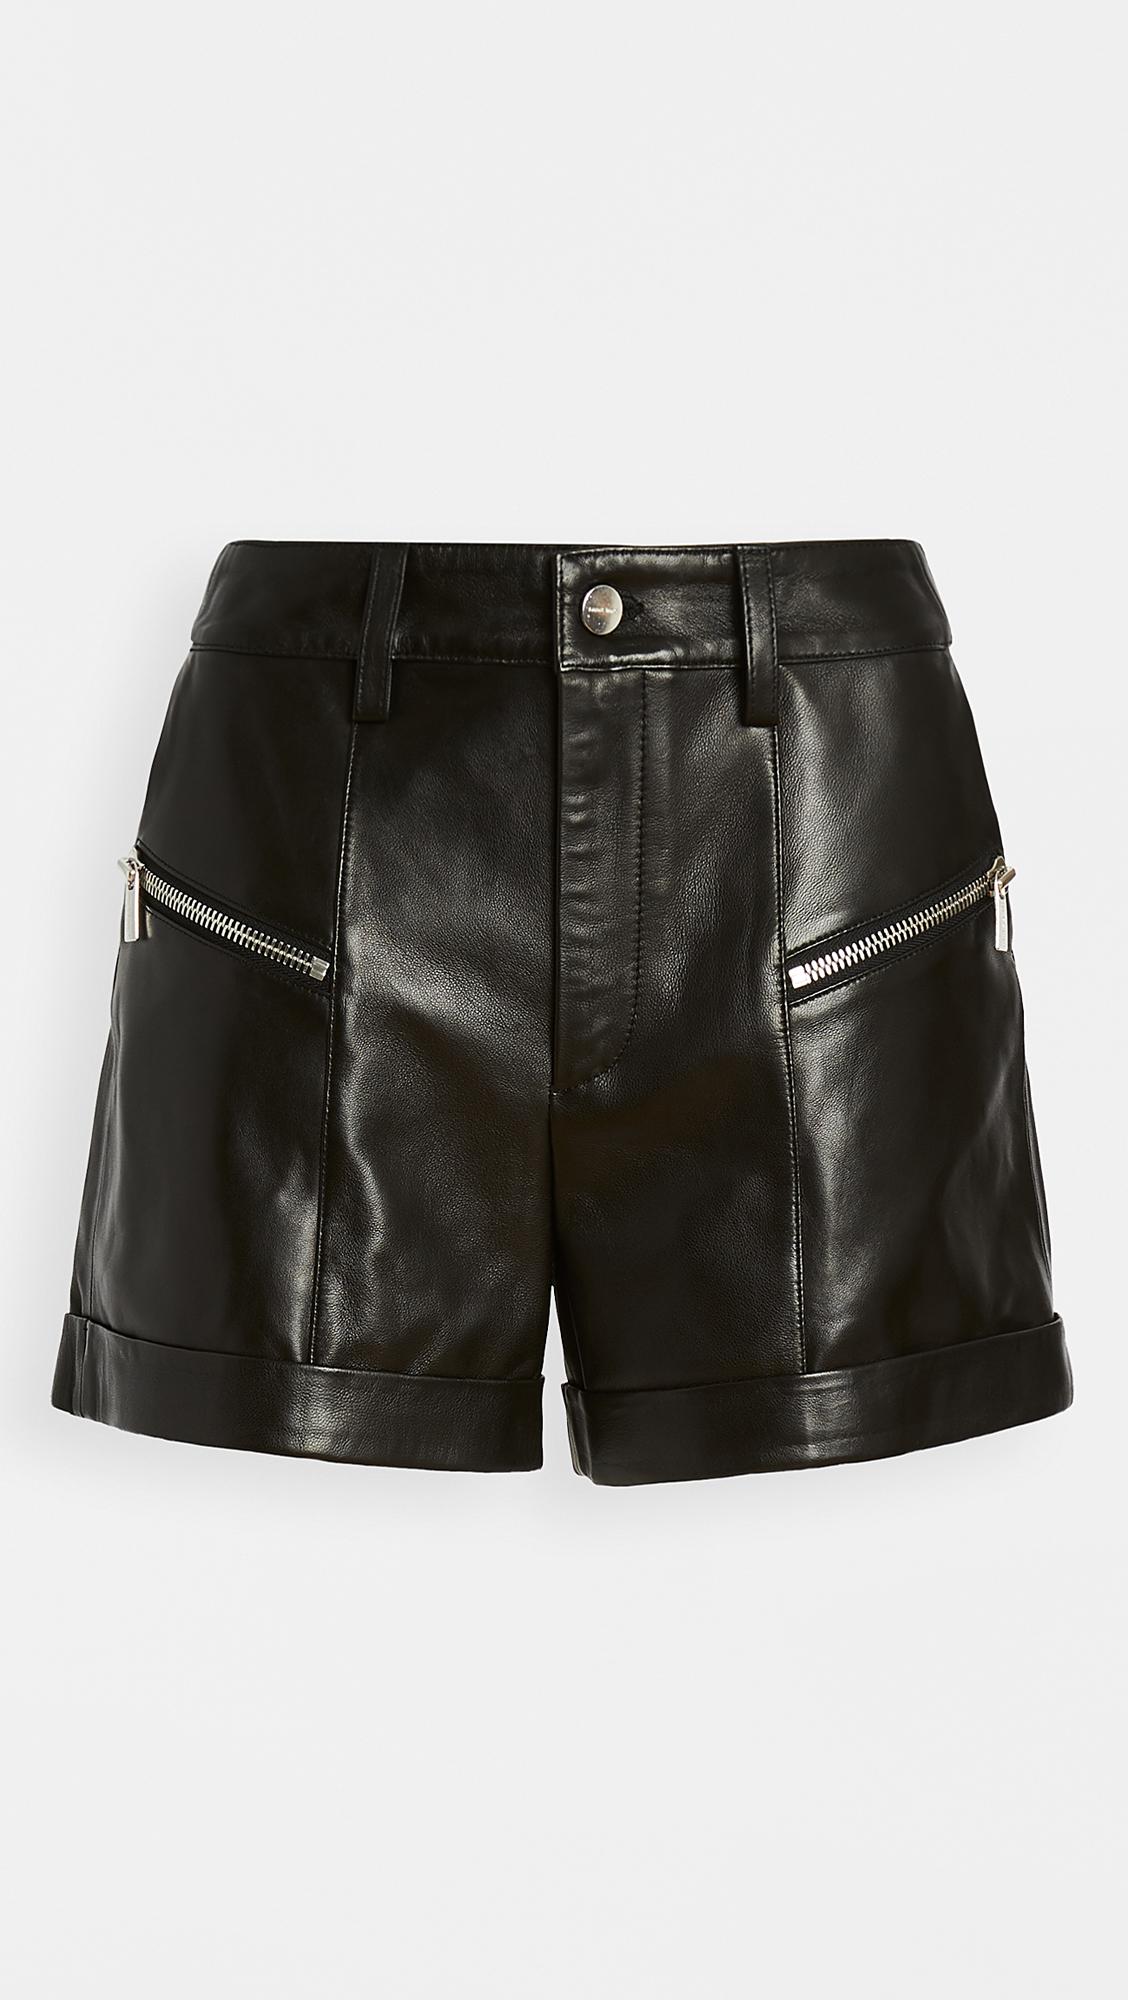 Celino Mens Black Faux Leather Double Stitched Without Holes 120 cm Long Belt